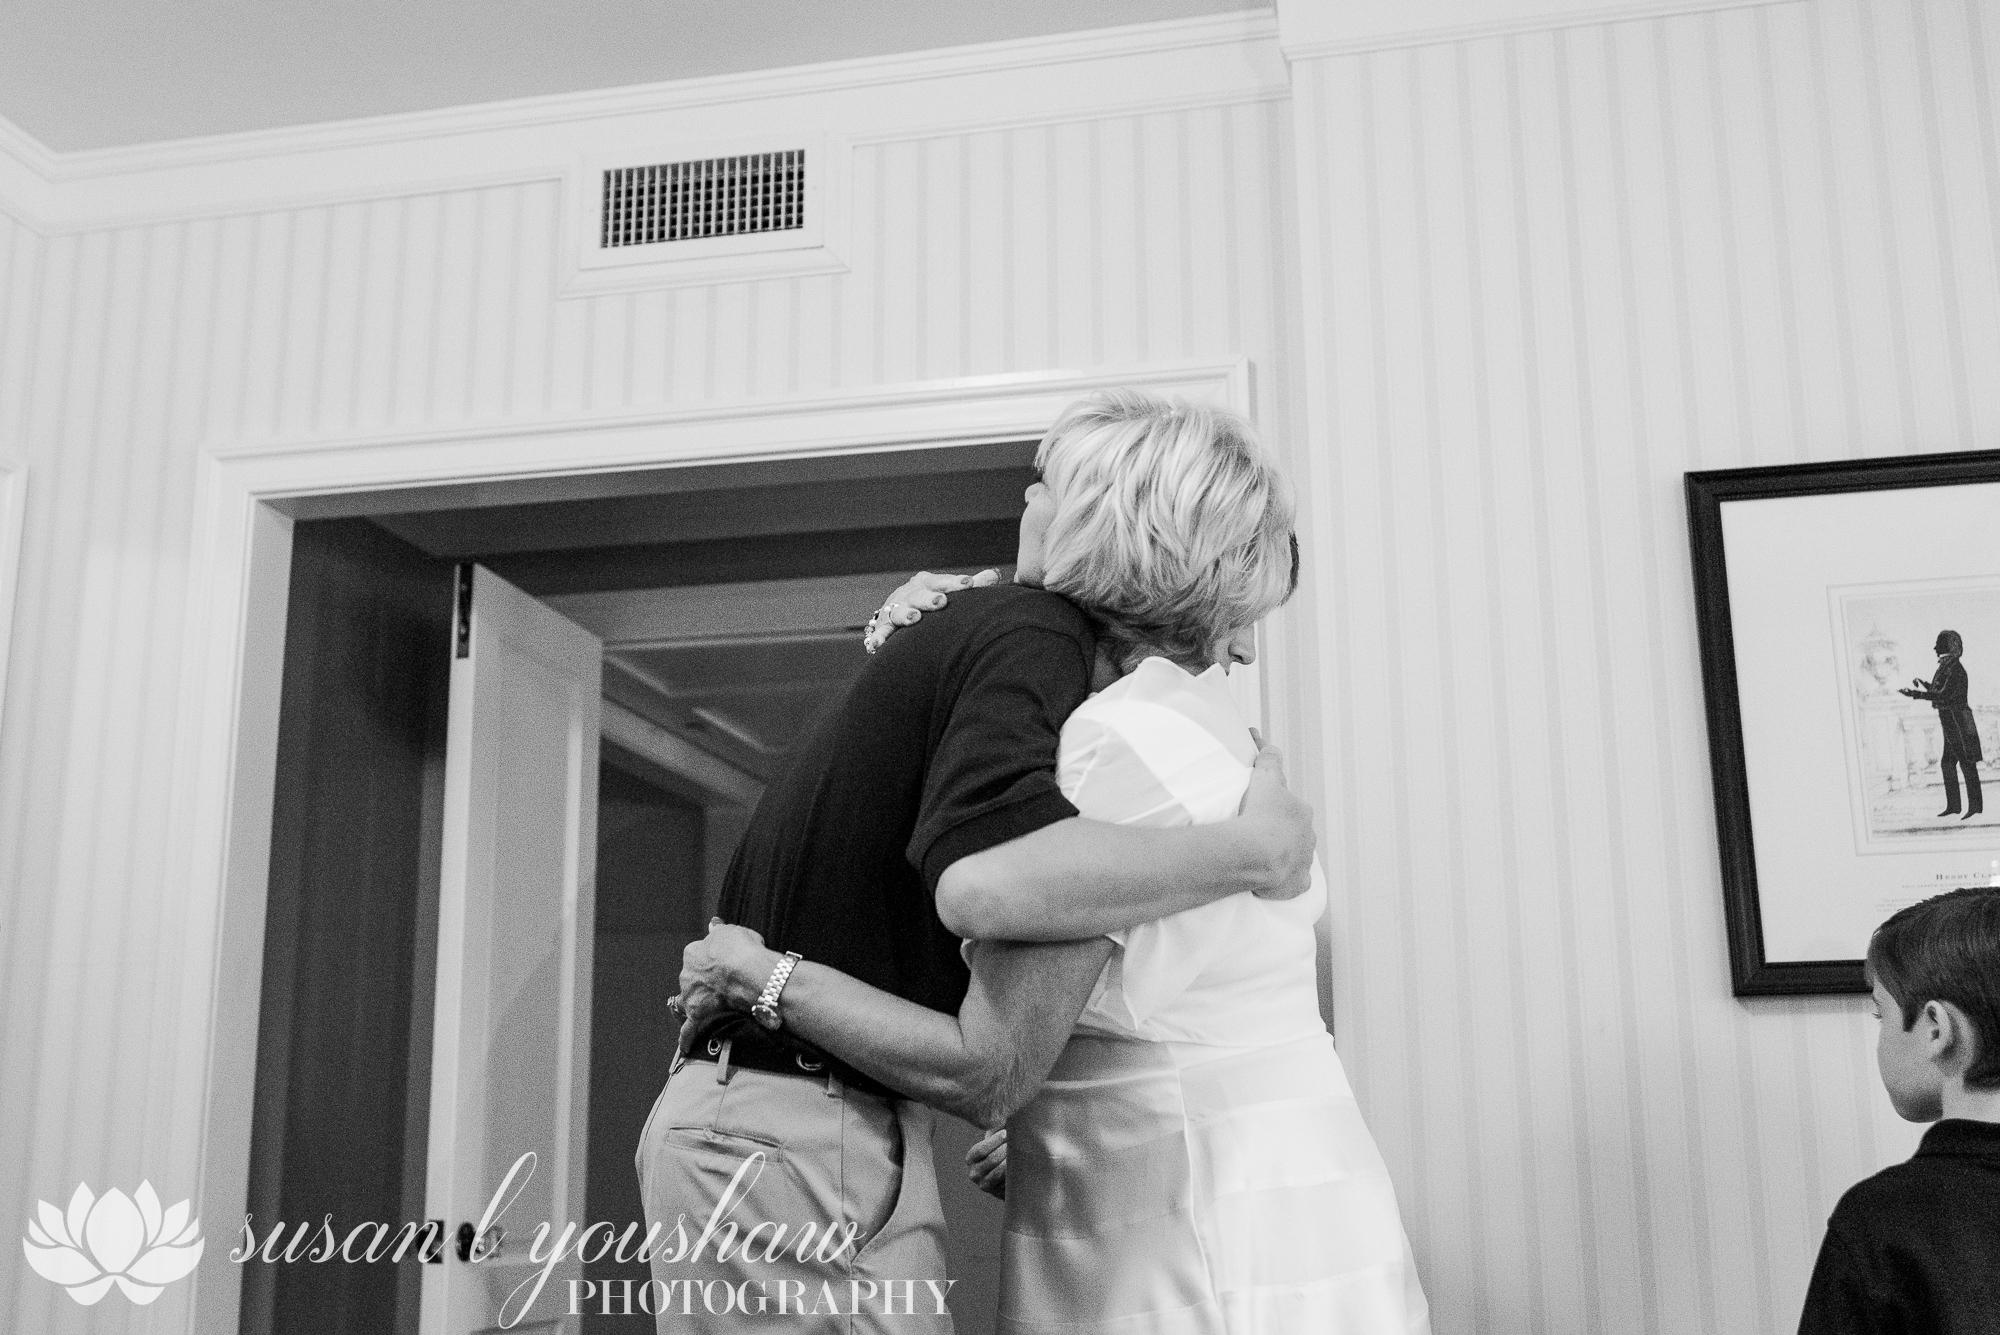 BLOG Carolyn Adams and Jim McCune 07-04-2018 SLY Photography-27.jpg